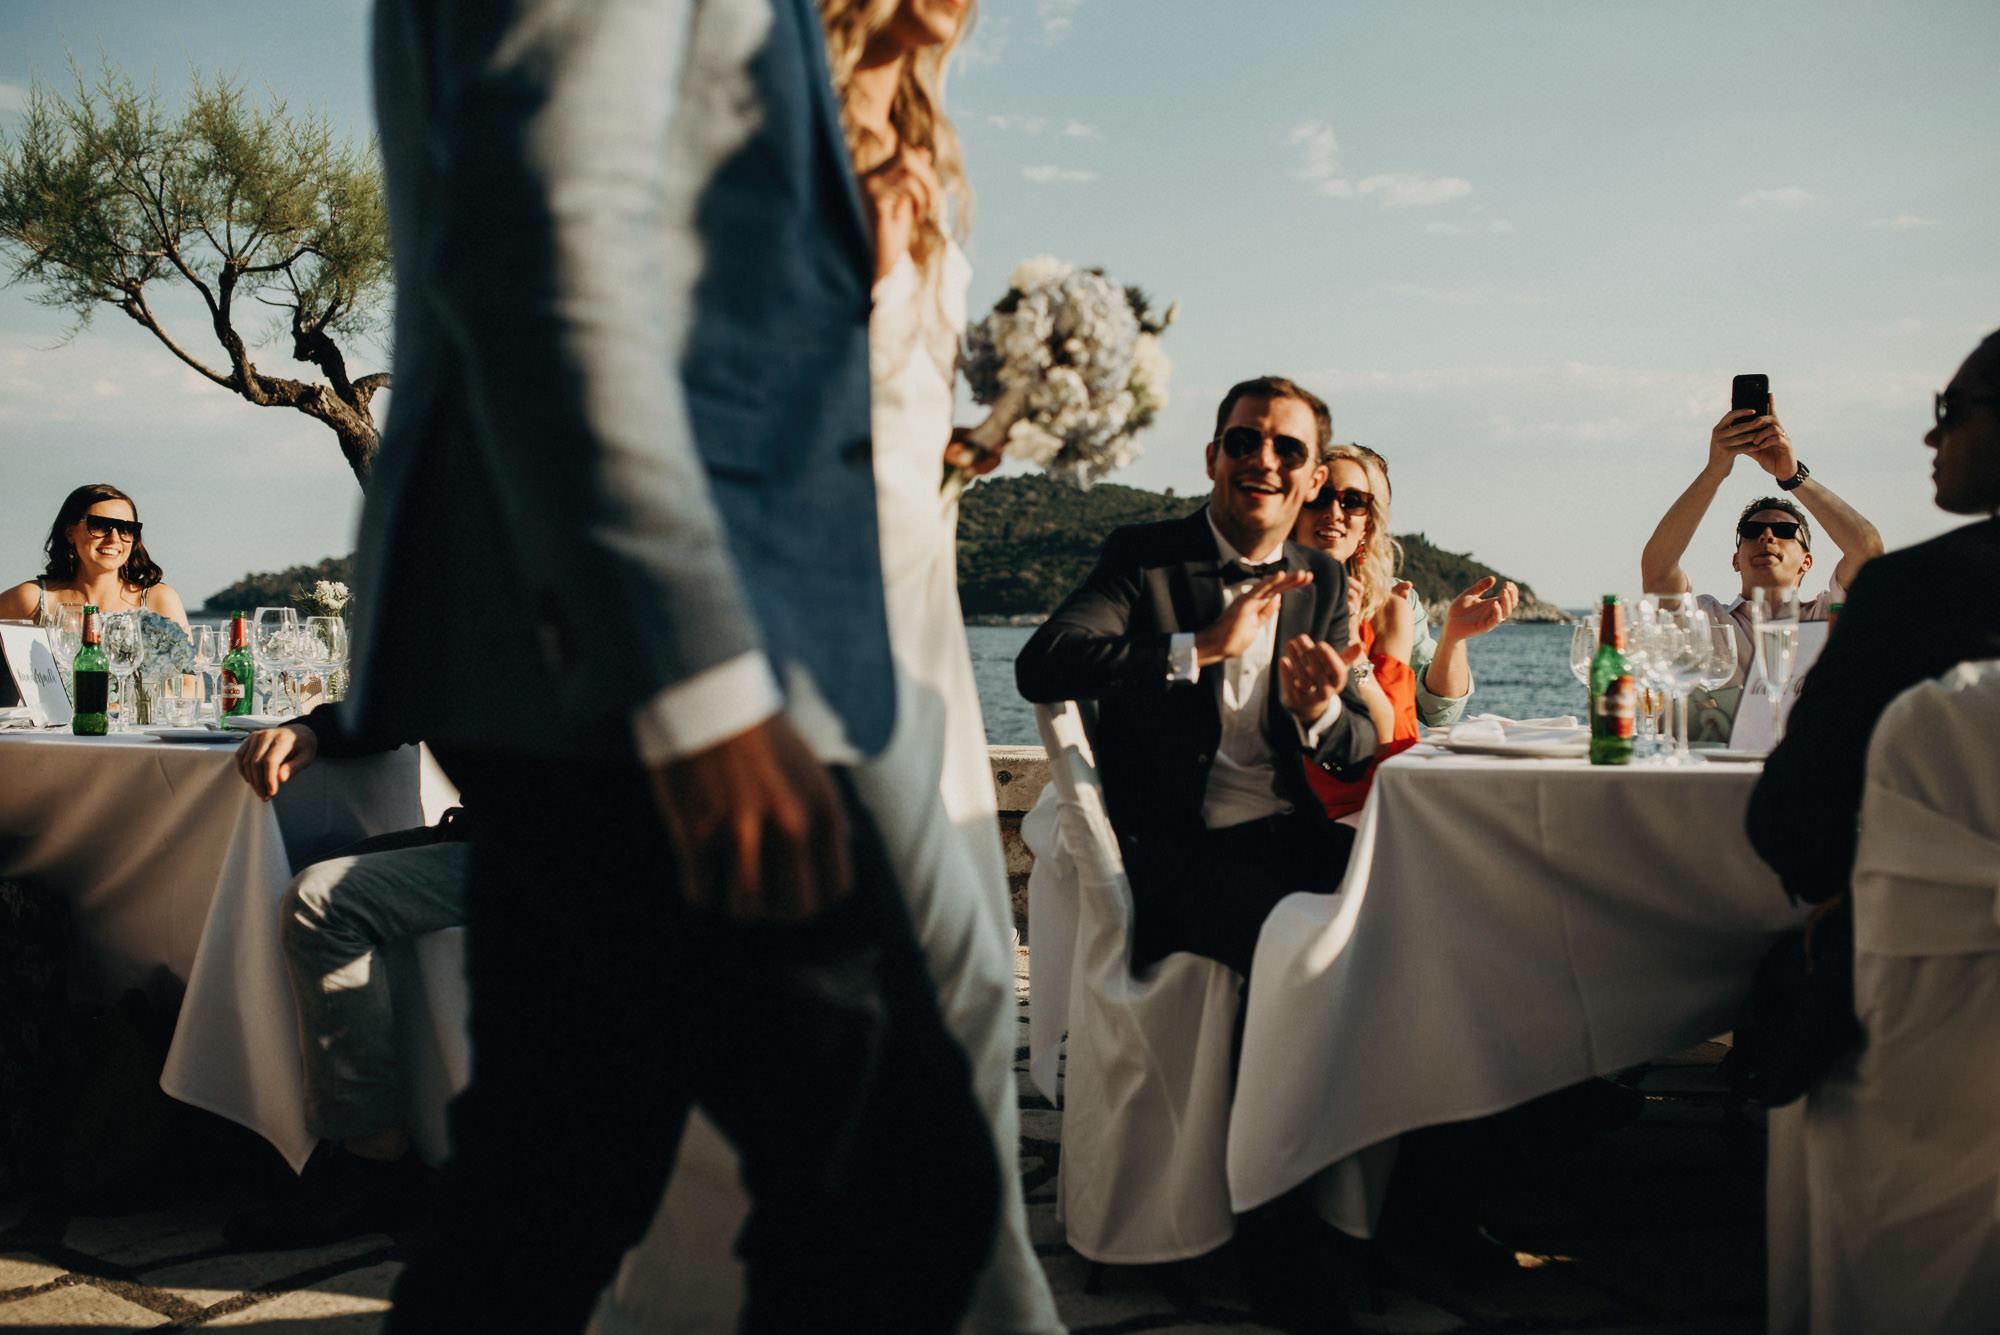 dubrovnik_croatia_wedding_photographer-jere_satamo-destination_weddings-057-web.jpg